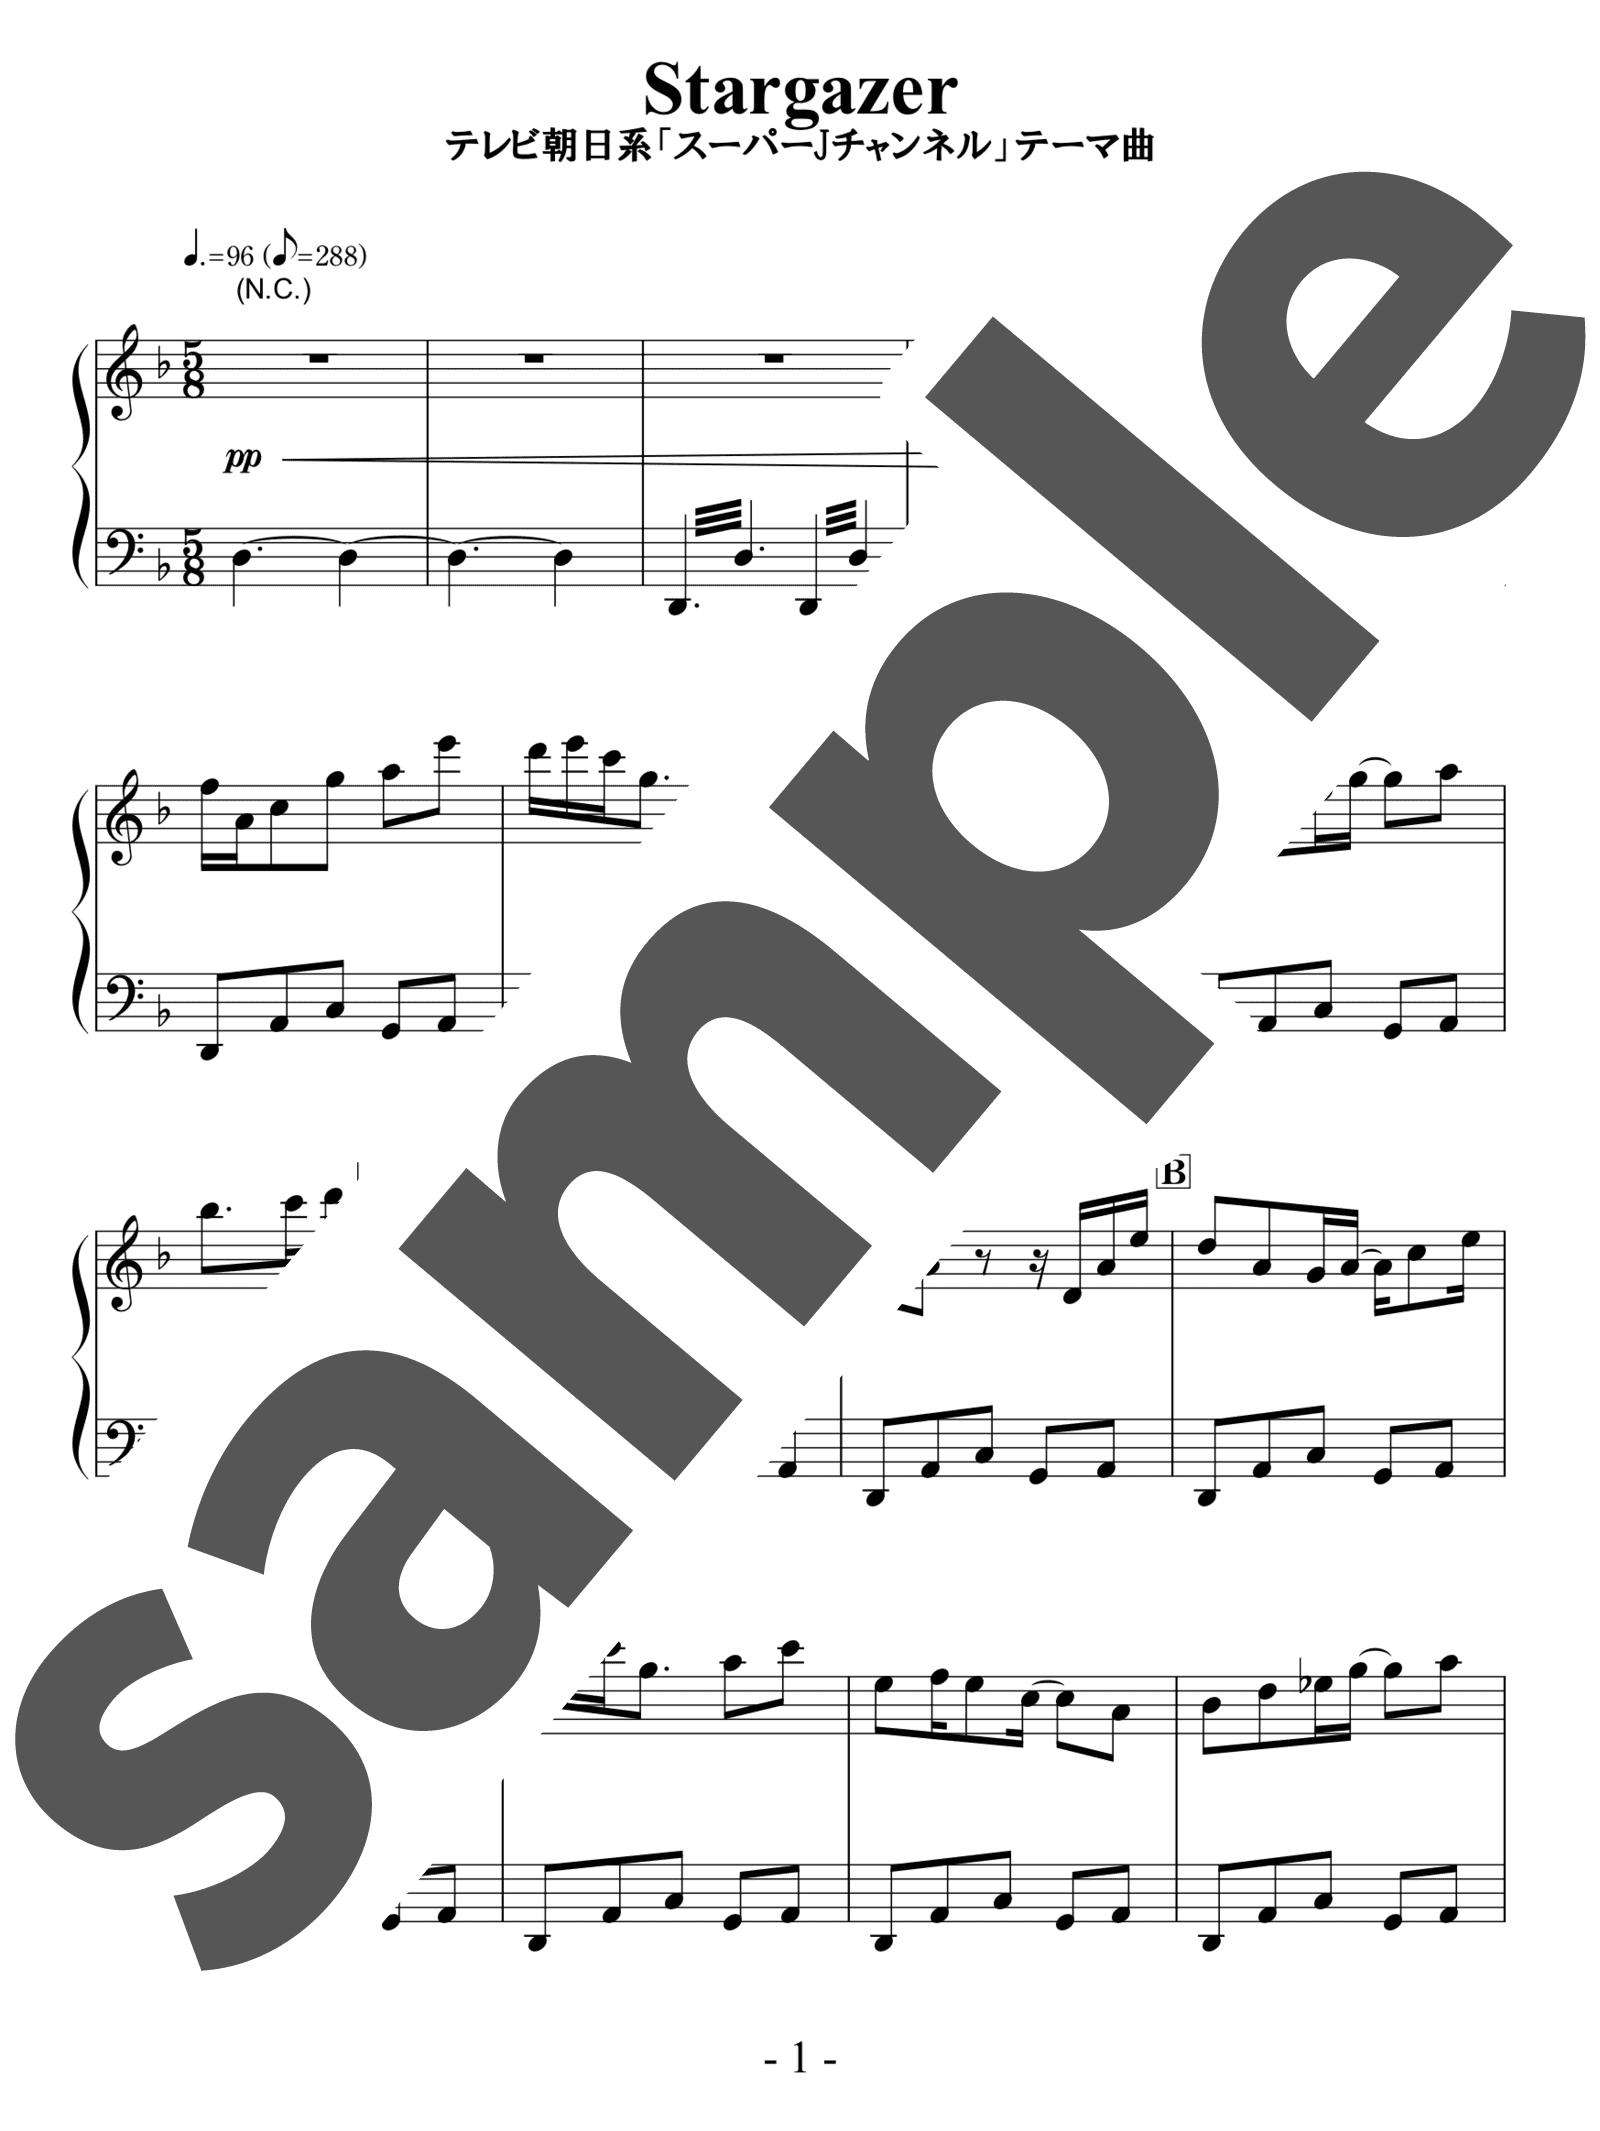 「Stargazer」のサンプル楽譜